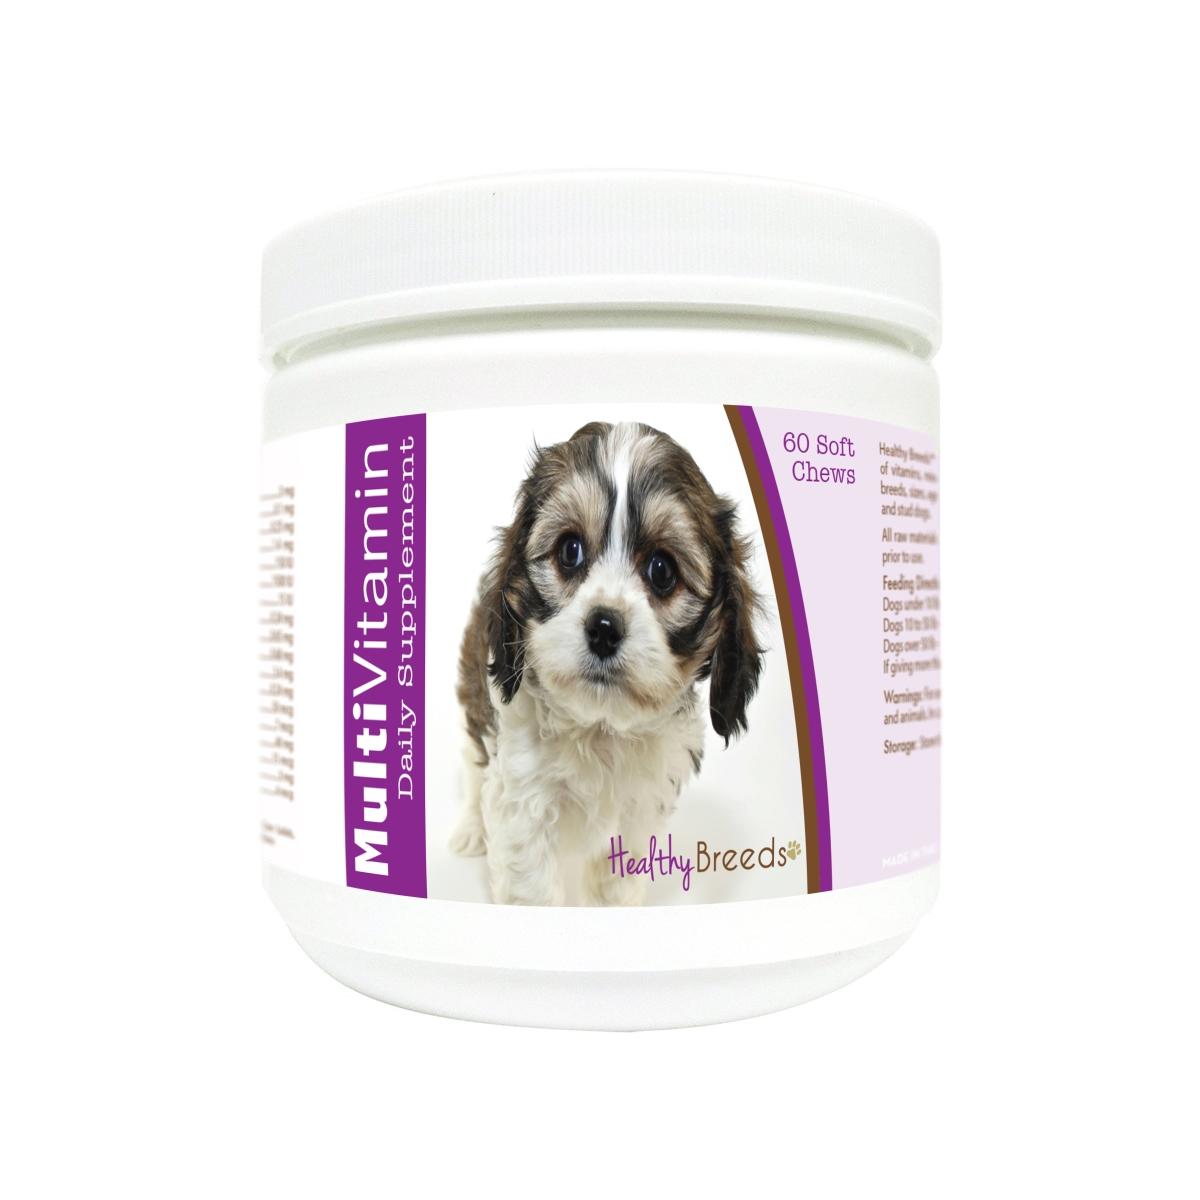 Healthy Breeds 840235175582 Cavachon Multi-Vitamin Soft Chews - 60 Count